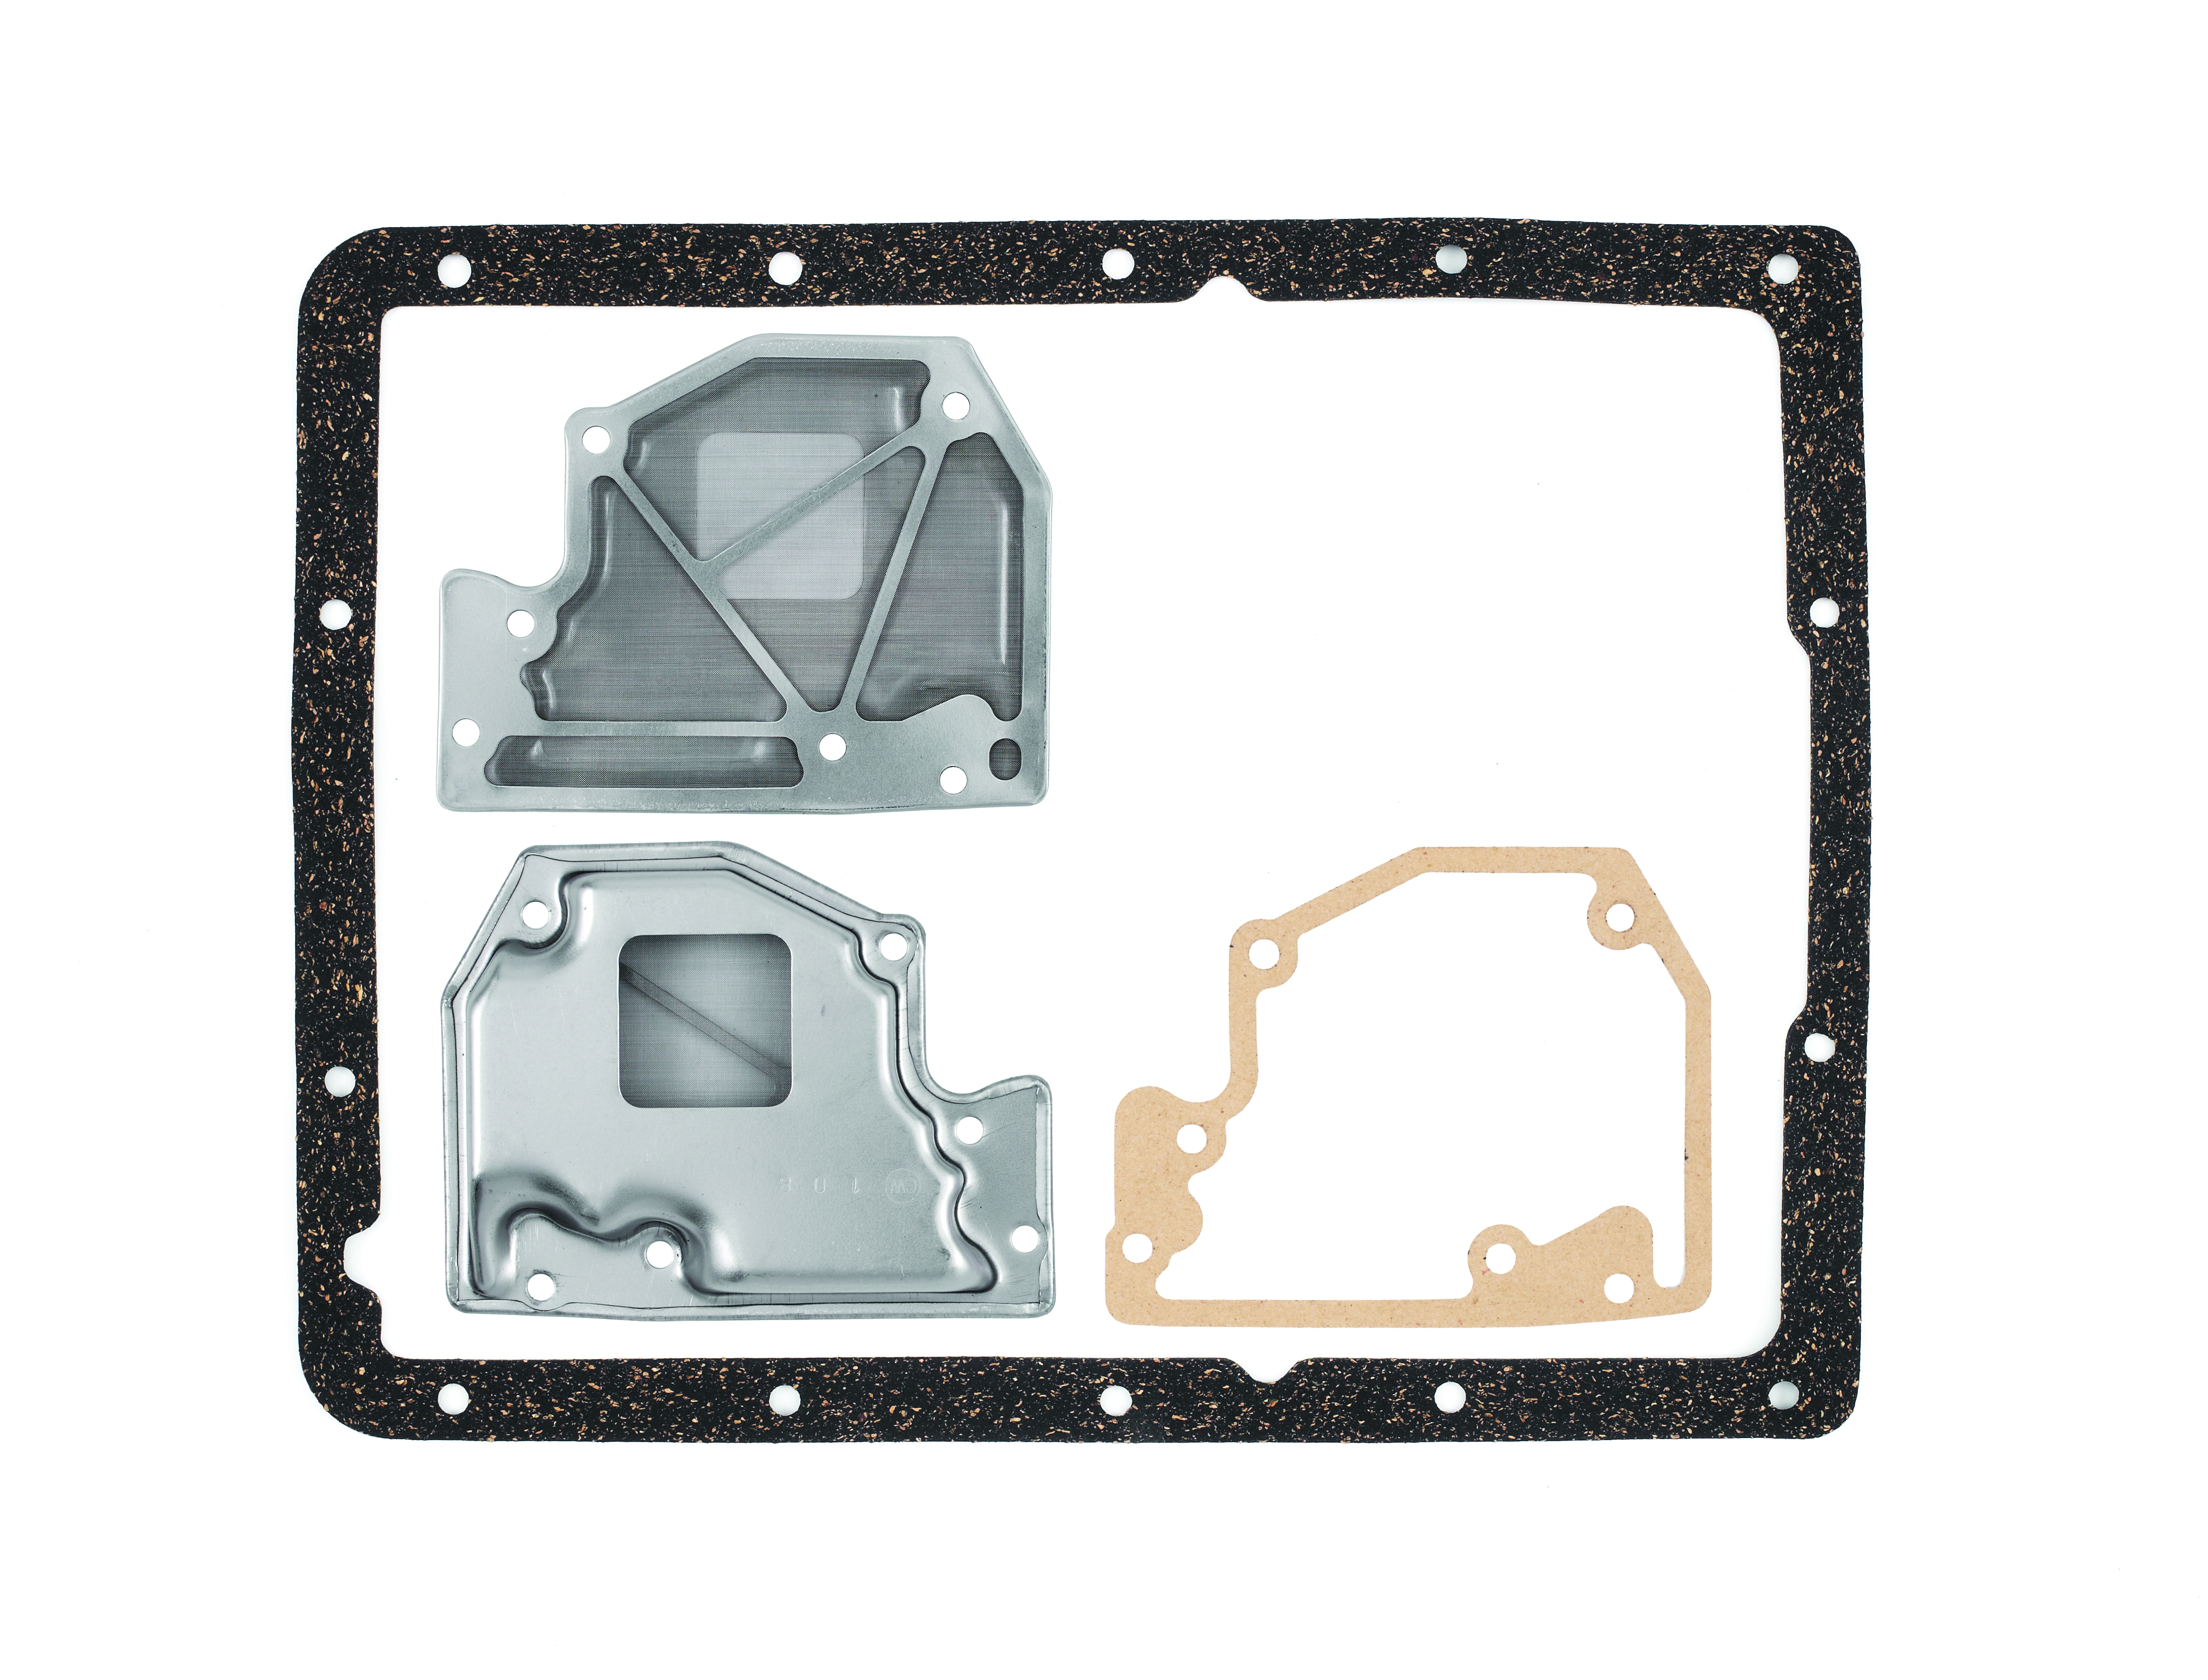 Ryco Automatic Transmission Filter Kit RTK11 fits Toyota Spacia 2.0 (SR40), 2...